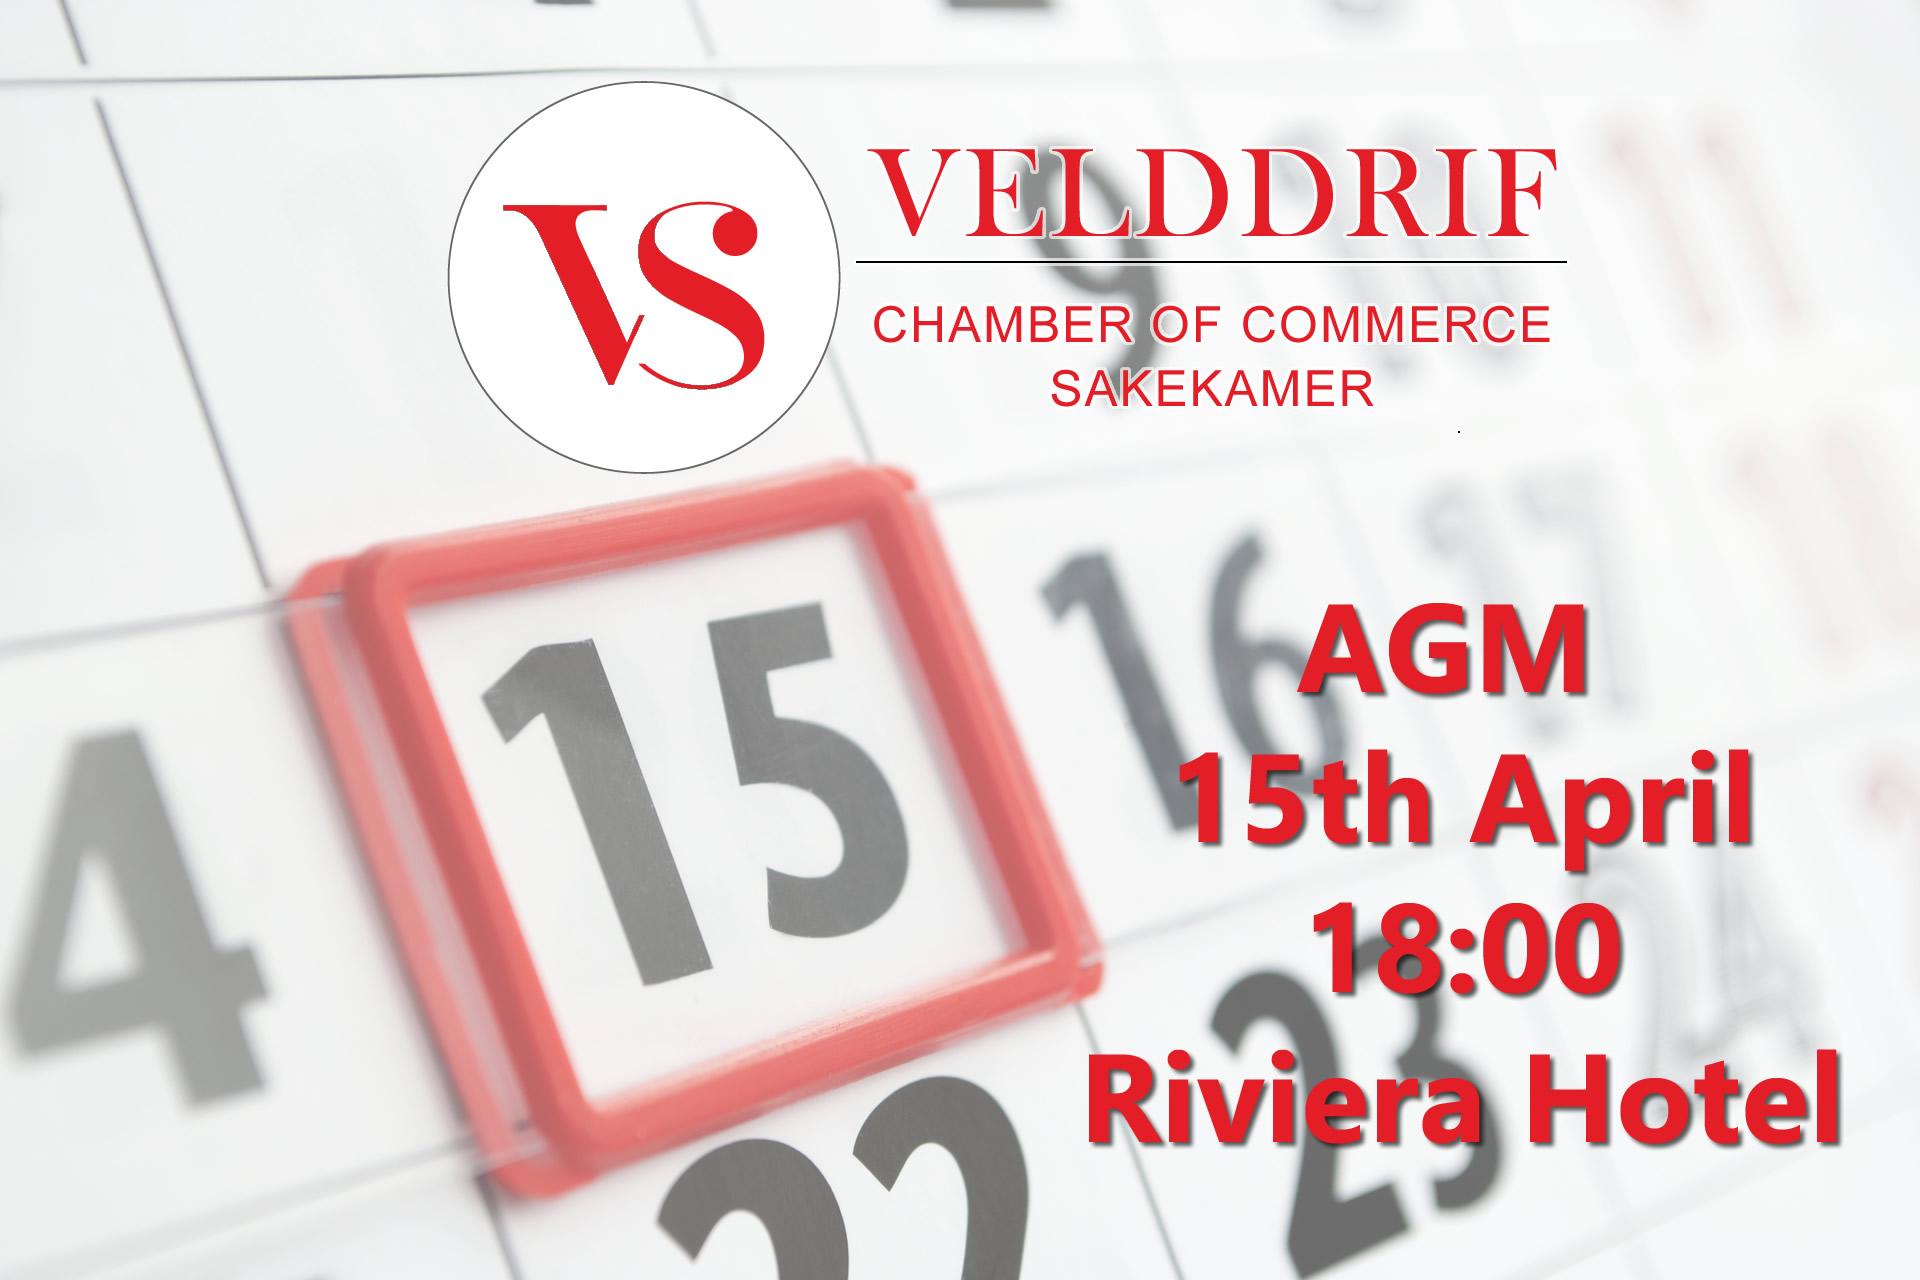 Velddrif AGM April 2021